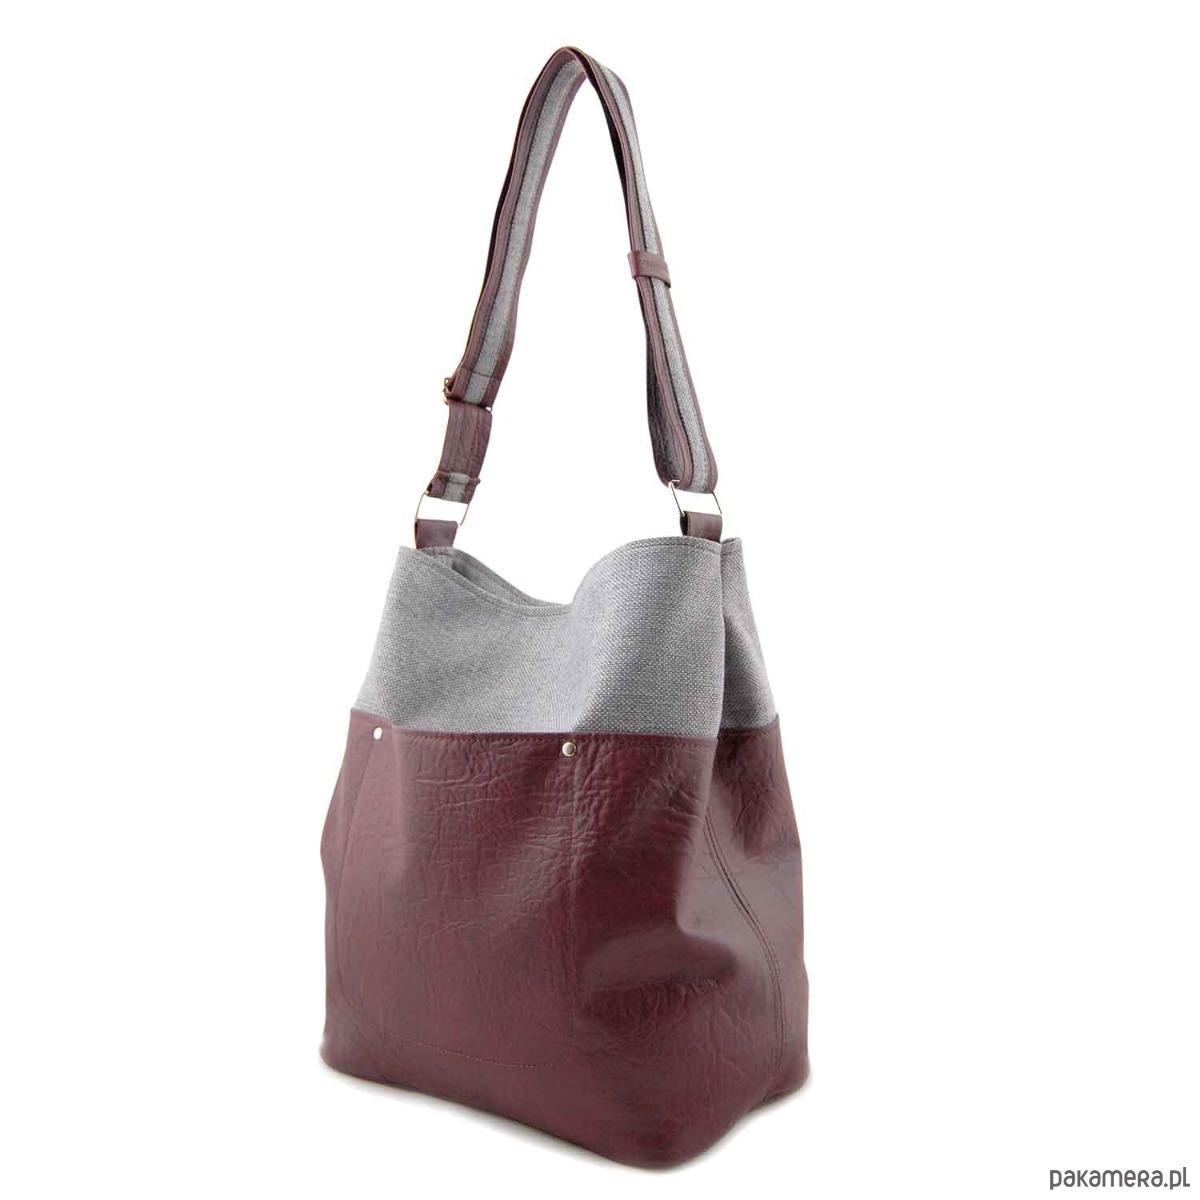 2ee8d8f40b38f FRIDA - torba worek - burgund i szara plecionka - torby na ramię - damskie  - Pakamera.pl